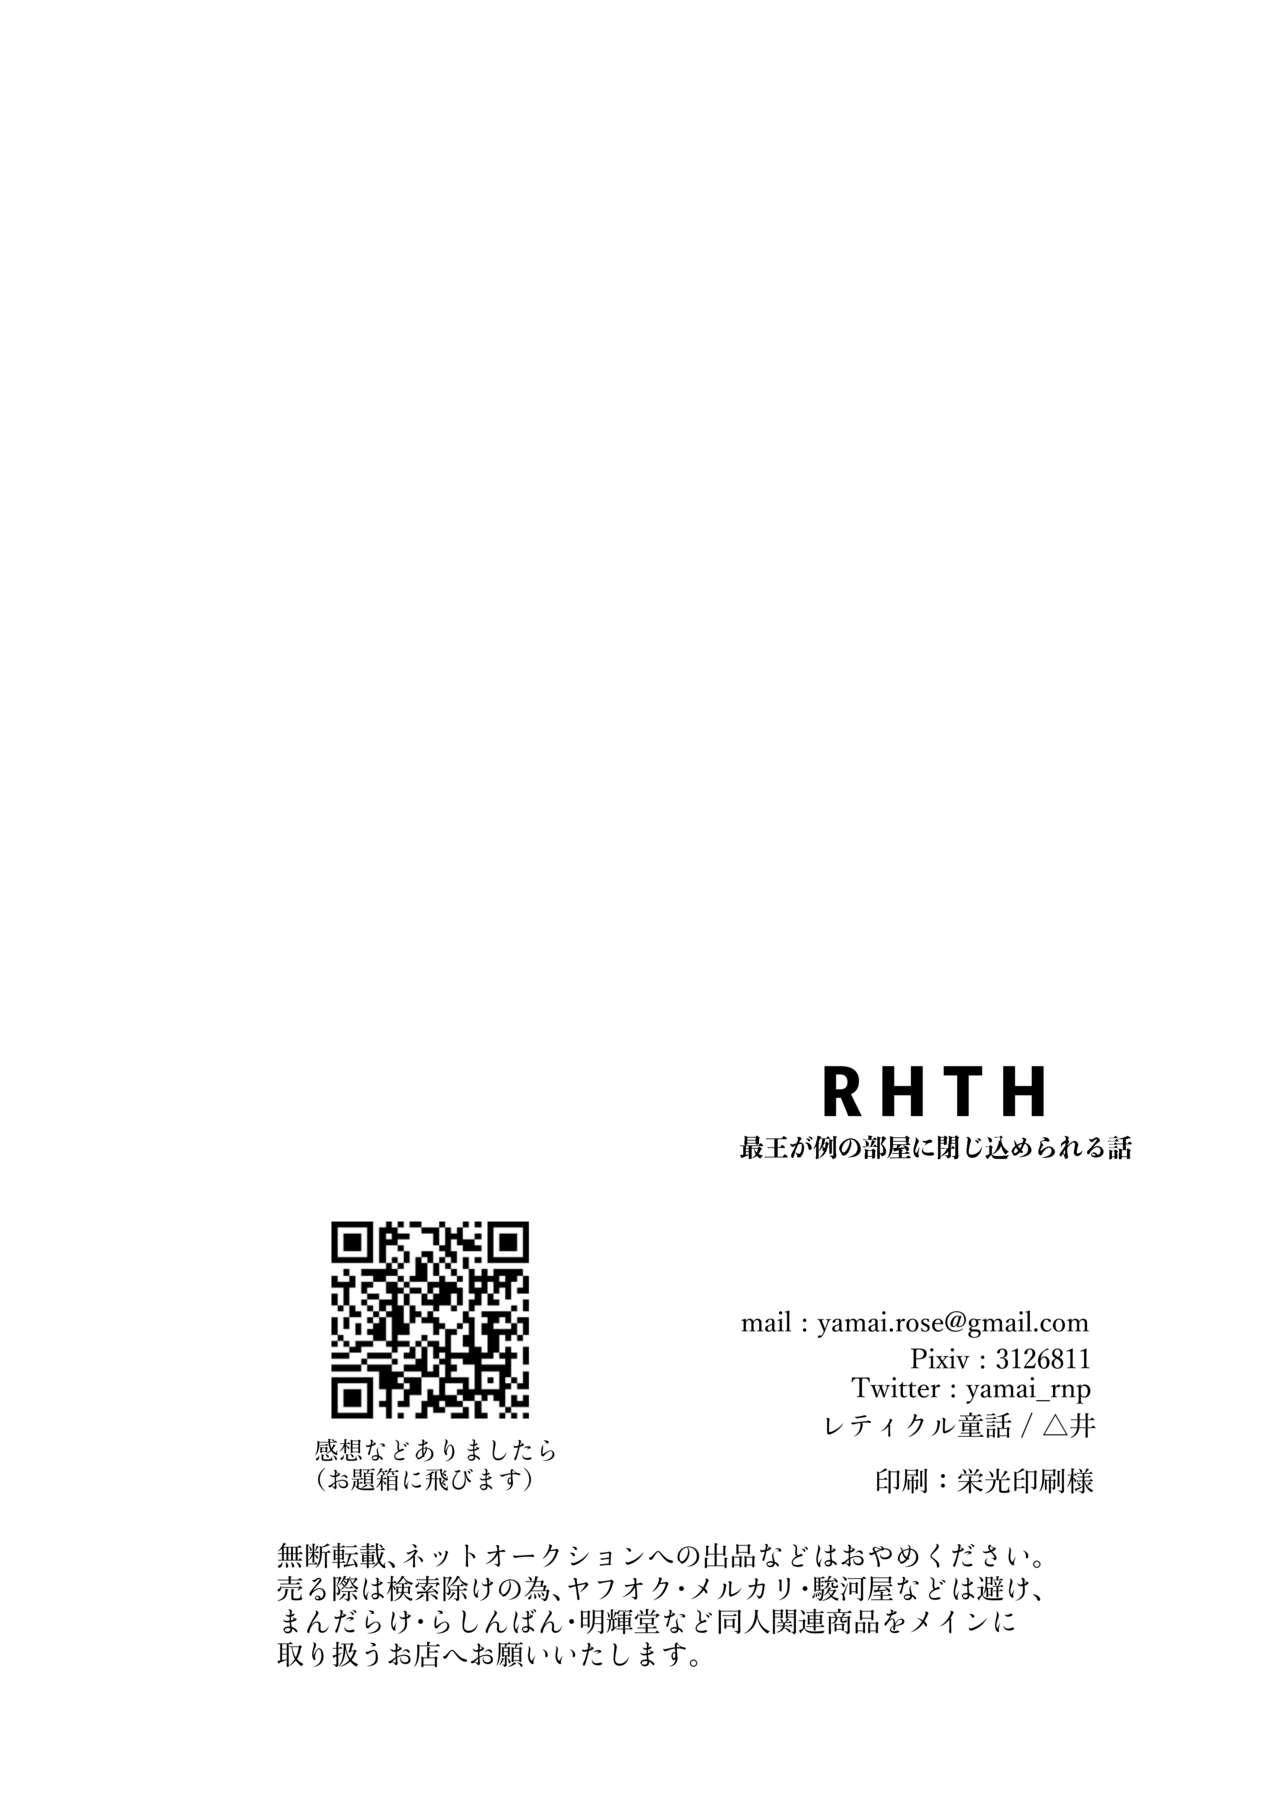 RHTH 16